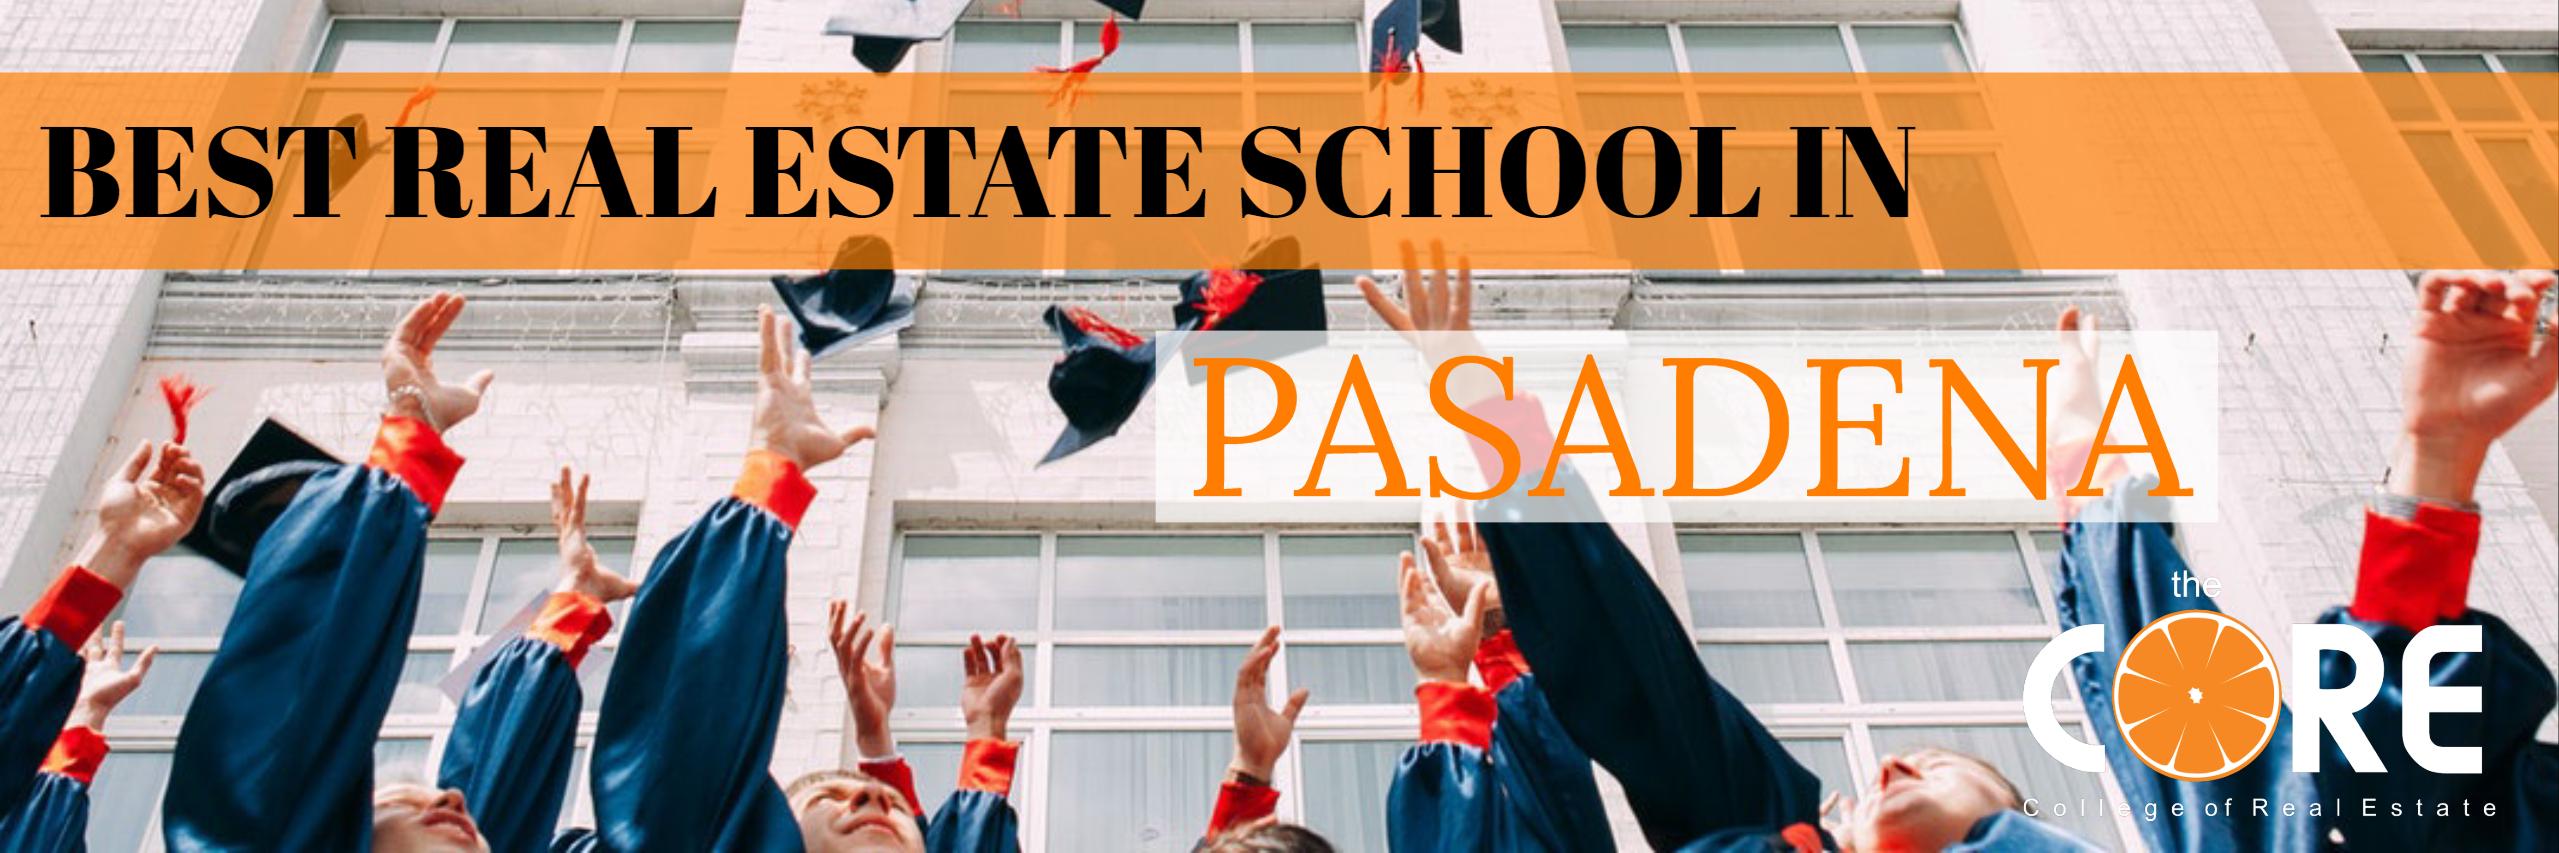 Best Real Estate School In Pasadena